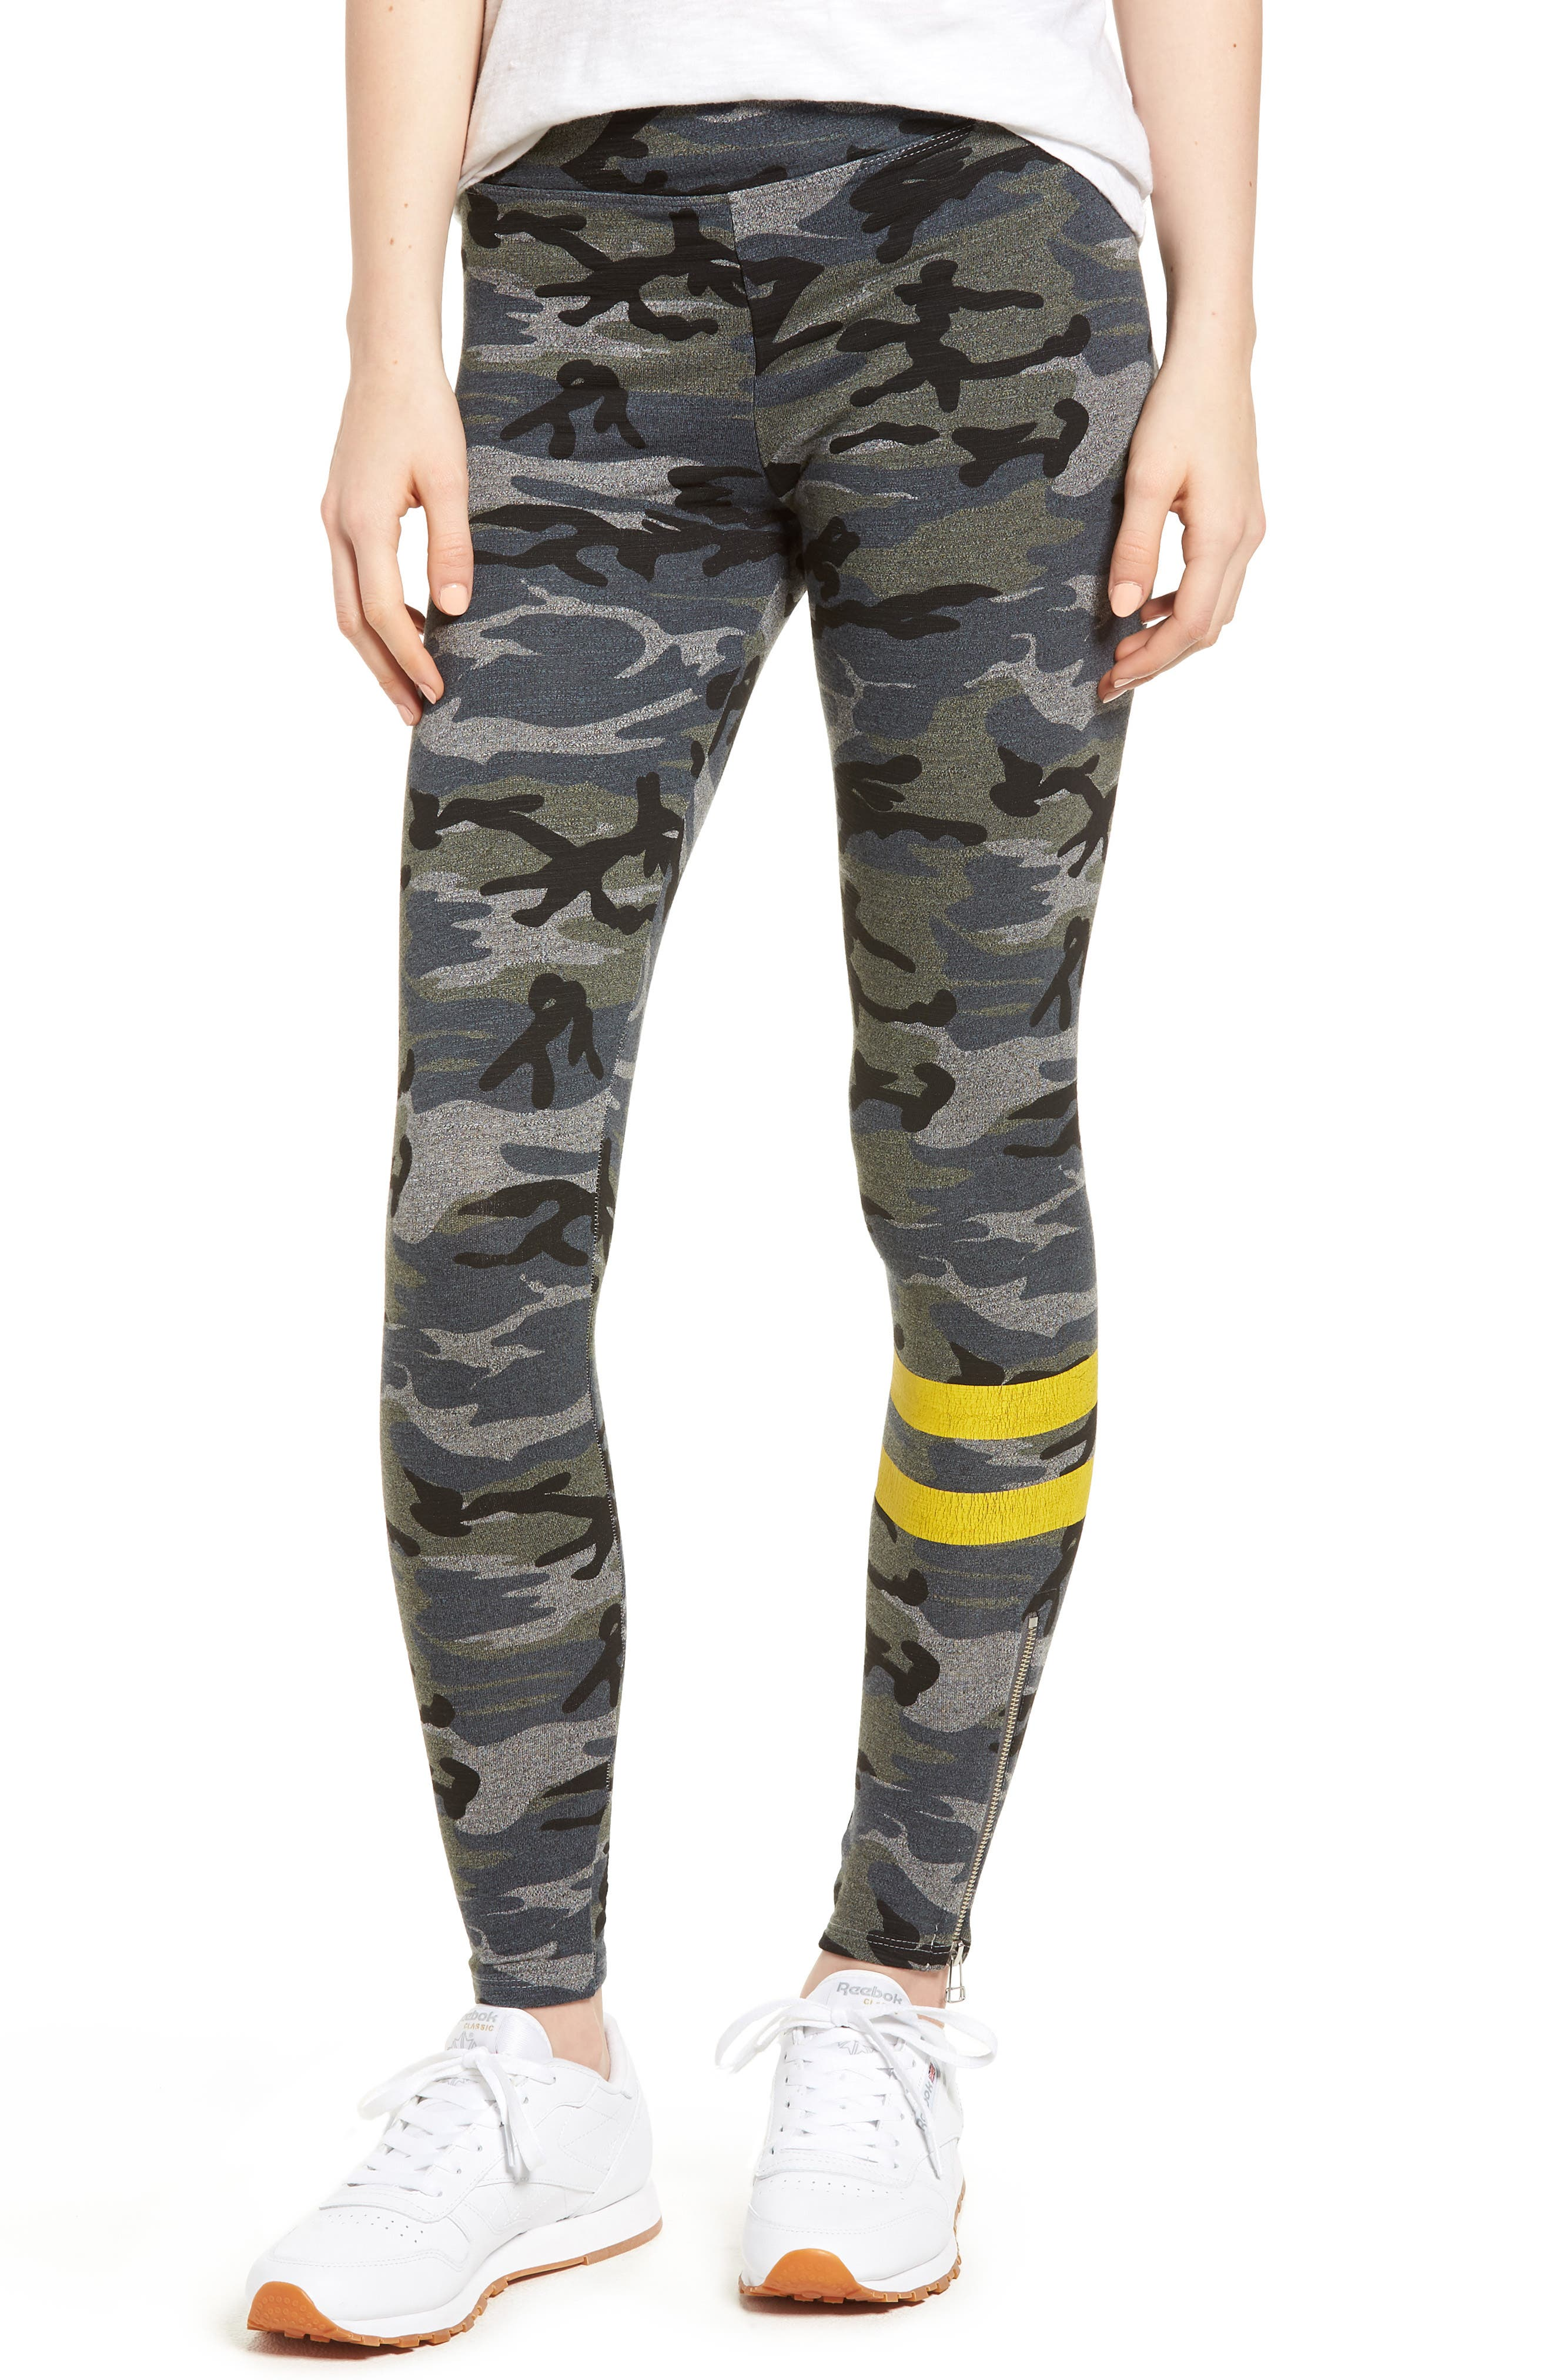 Stripe Camo Yoga Pants,                         Main,                         color,